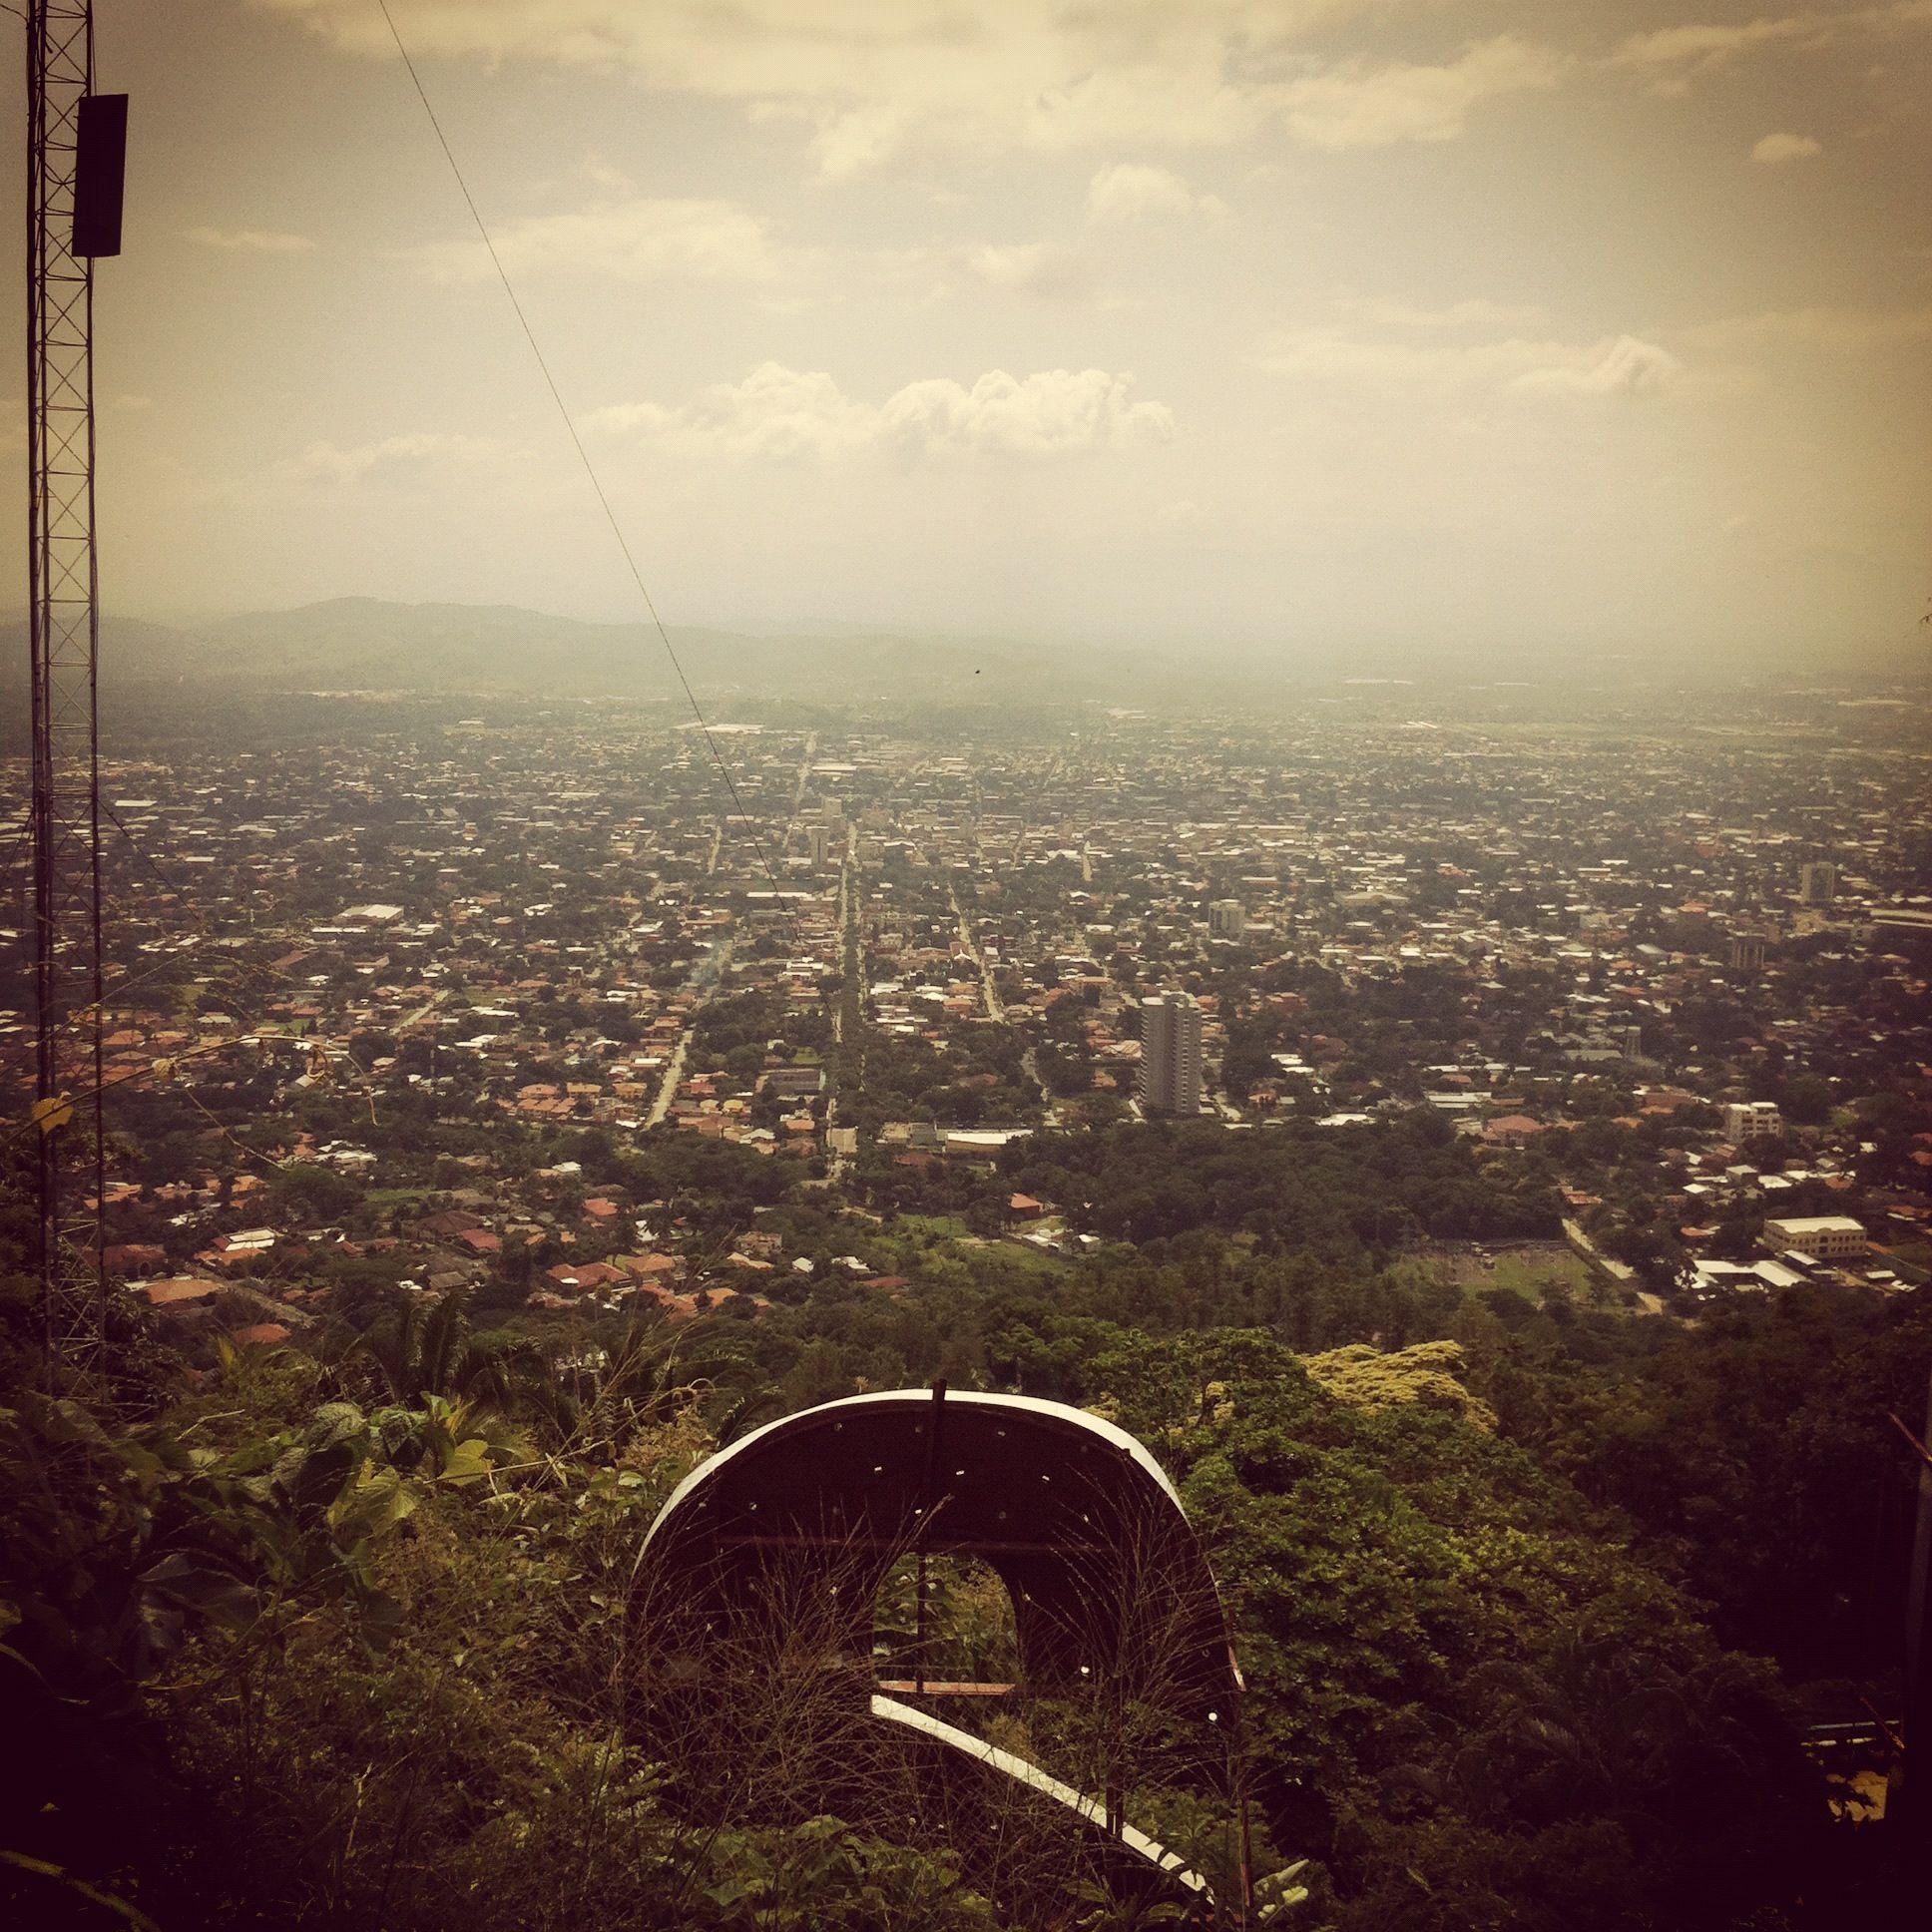 Honduras - San Pedro Sula - Meredon #sanpedrosula Honduras - San Pedro Sula - Meredon #sanpedrosula Honduras - San Pedro Sula - Meredon #sanpedrosula Honduras - San Pedro Sula - Meredon #sanpedrosula